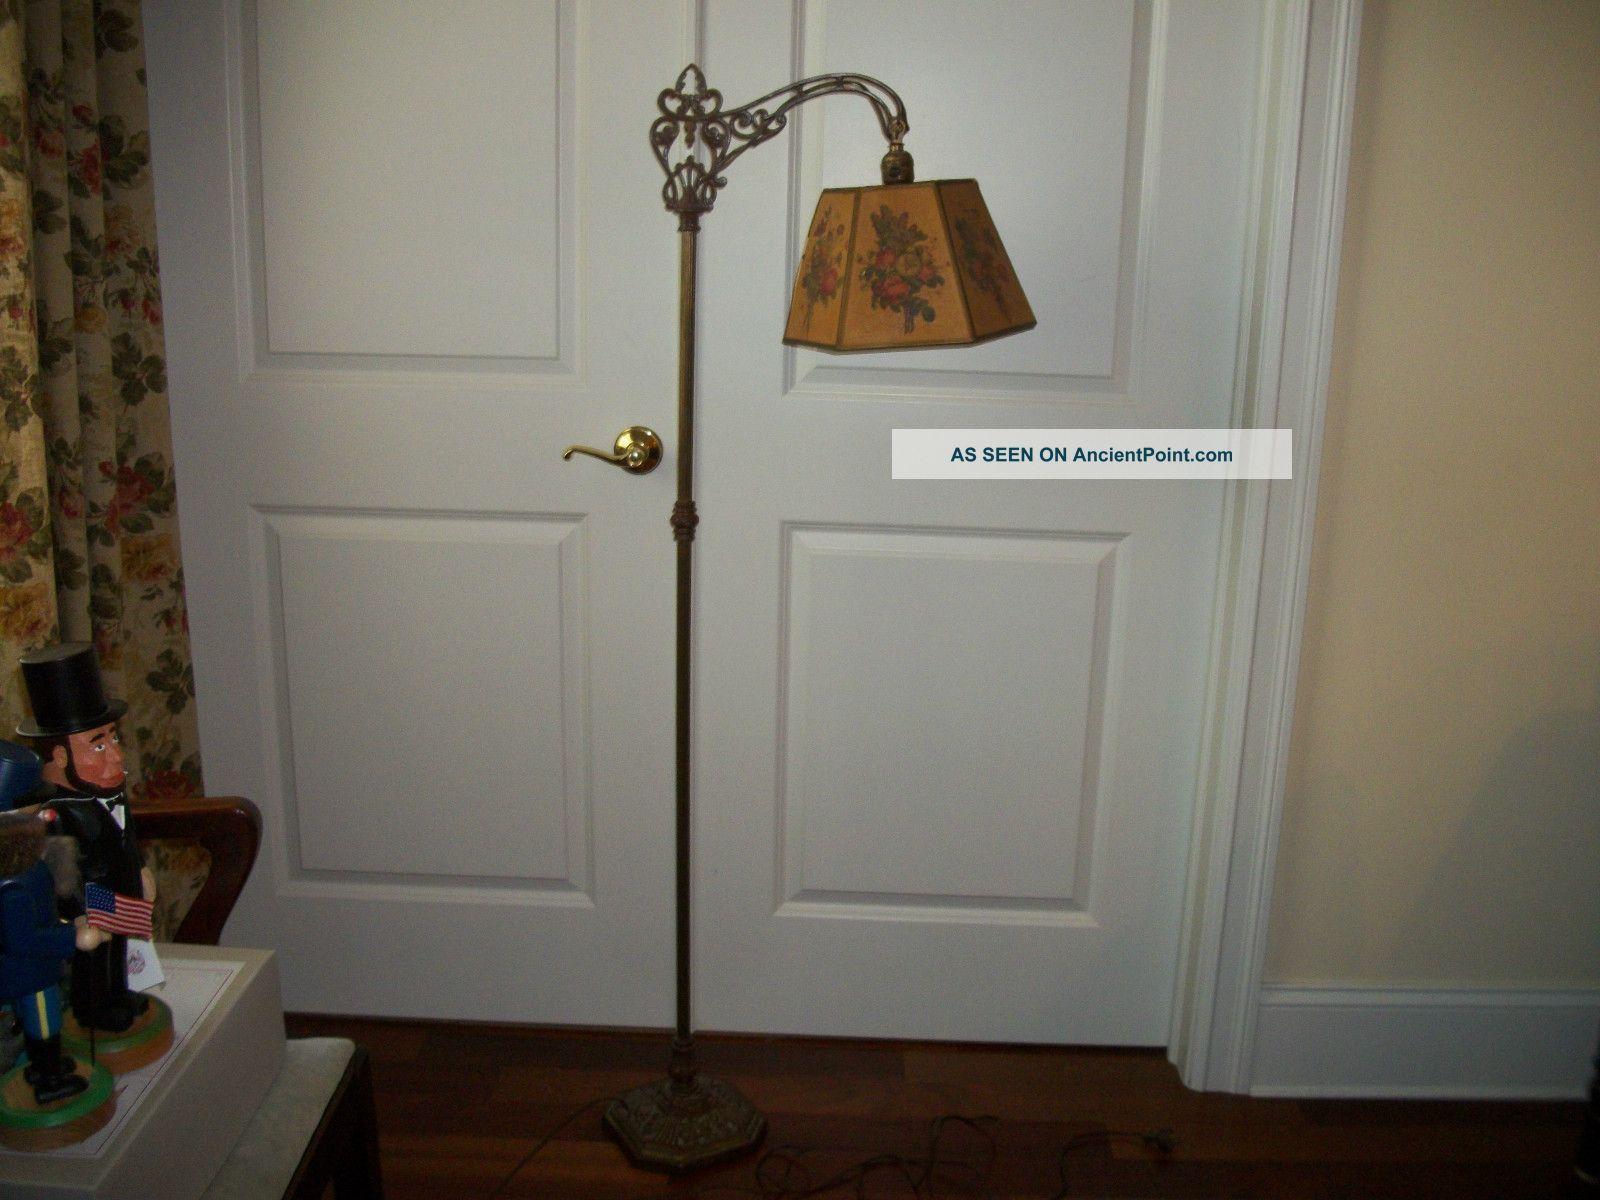 vtg_early_1920__s_antique_art_deco_bridge_arm_cast_iron_floor_lamp ...